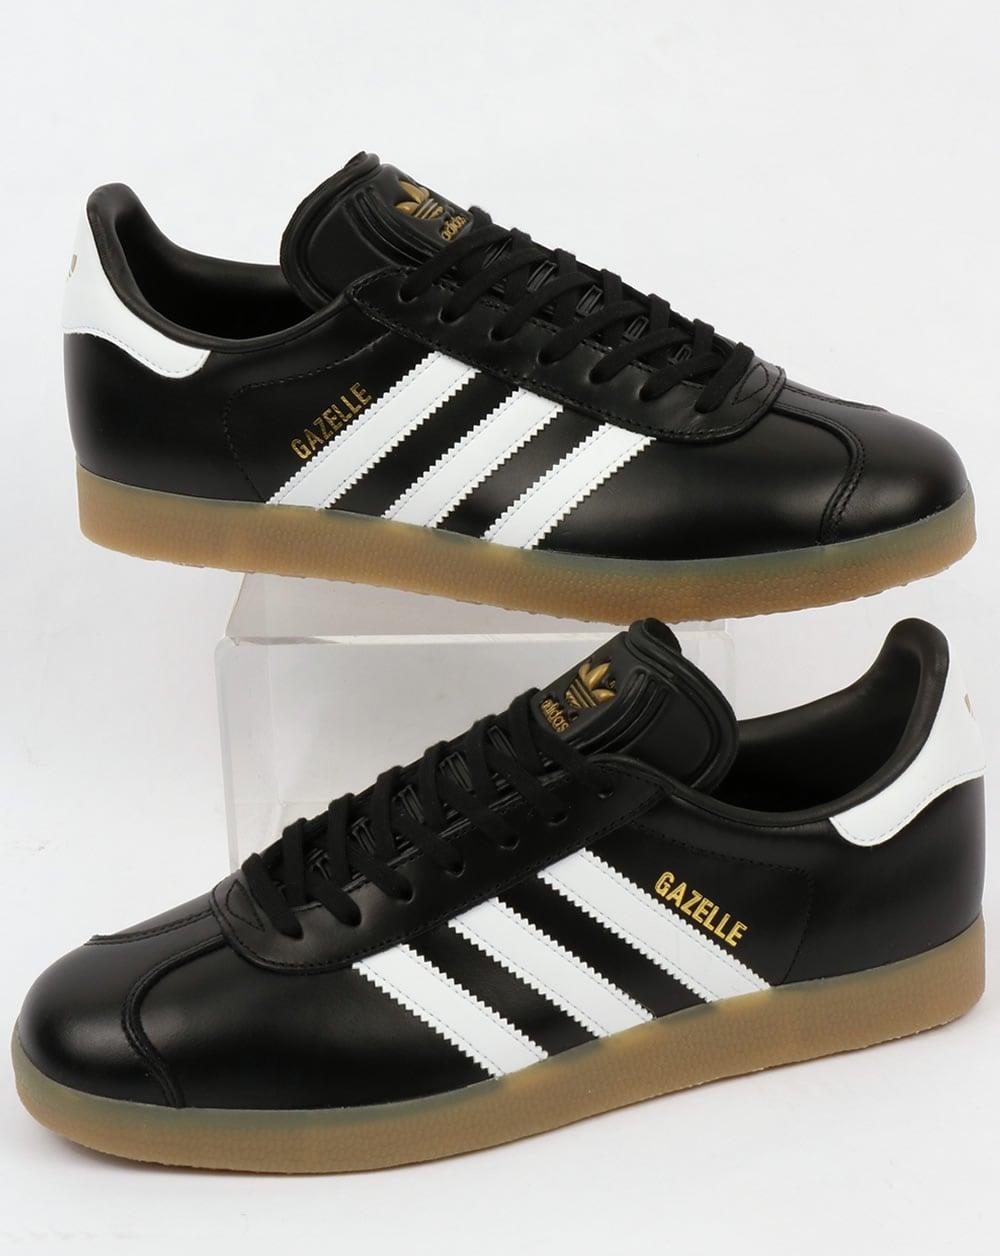 granero Australia Humano  Adidas Gazelle Trainers Black/White/Gum,leather,,originals,shoes,mens